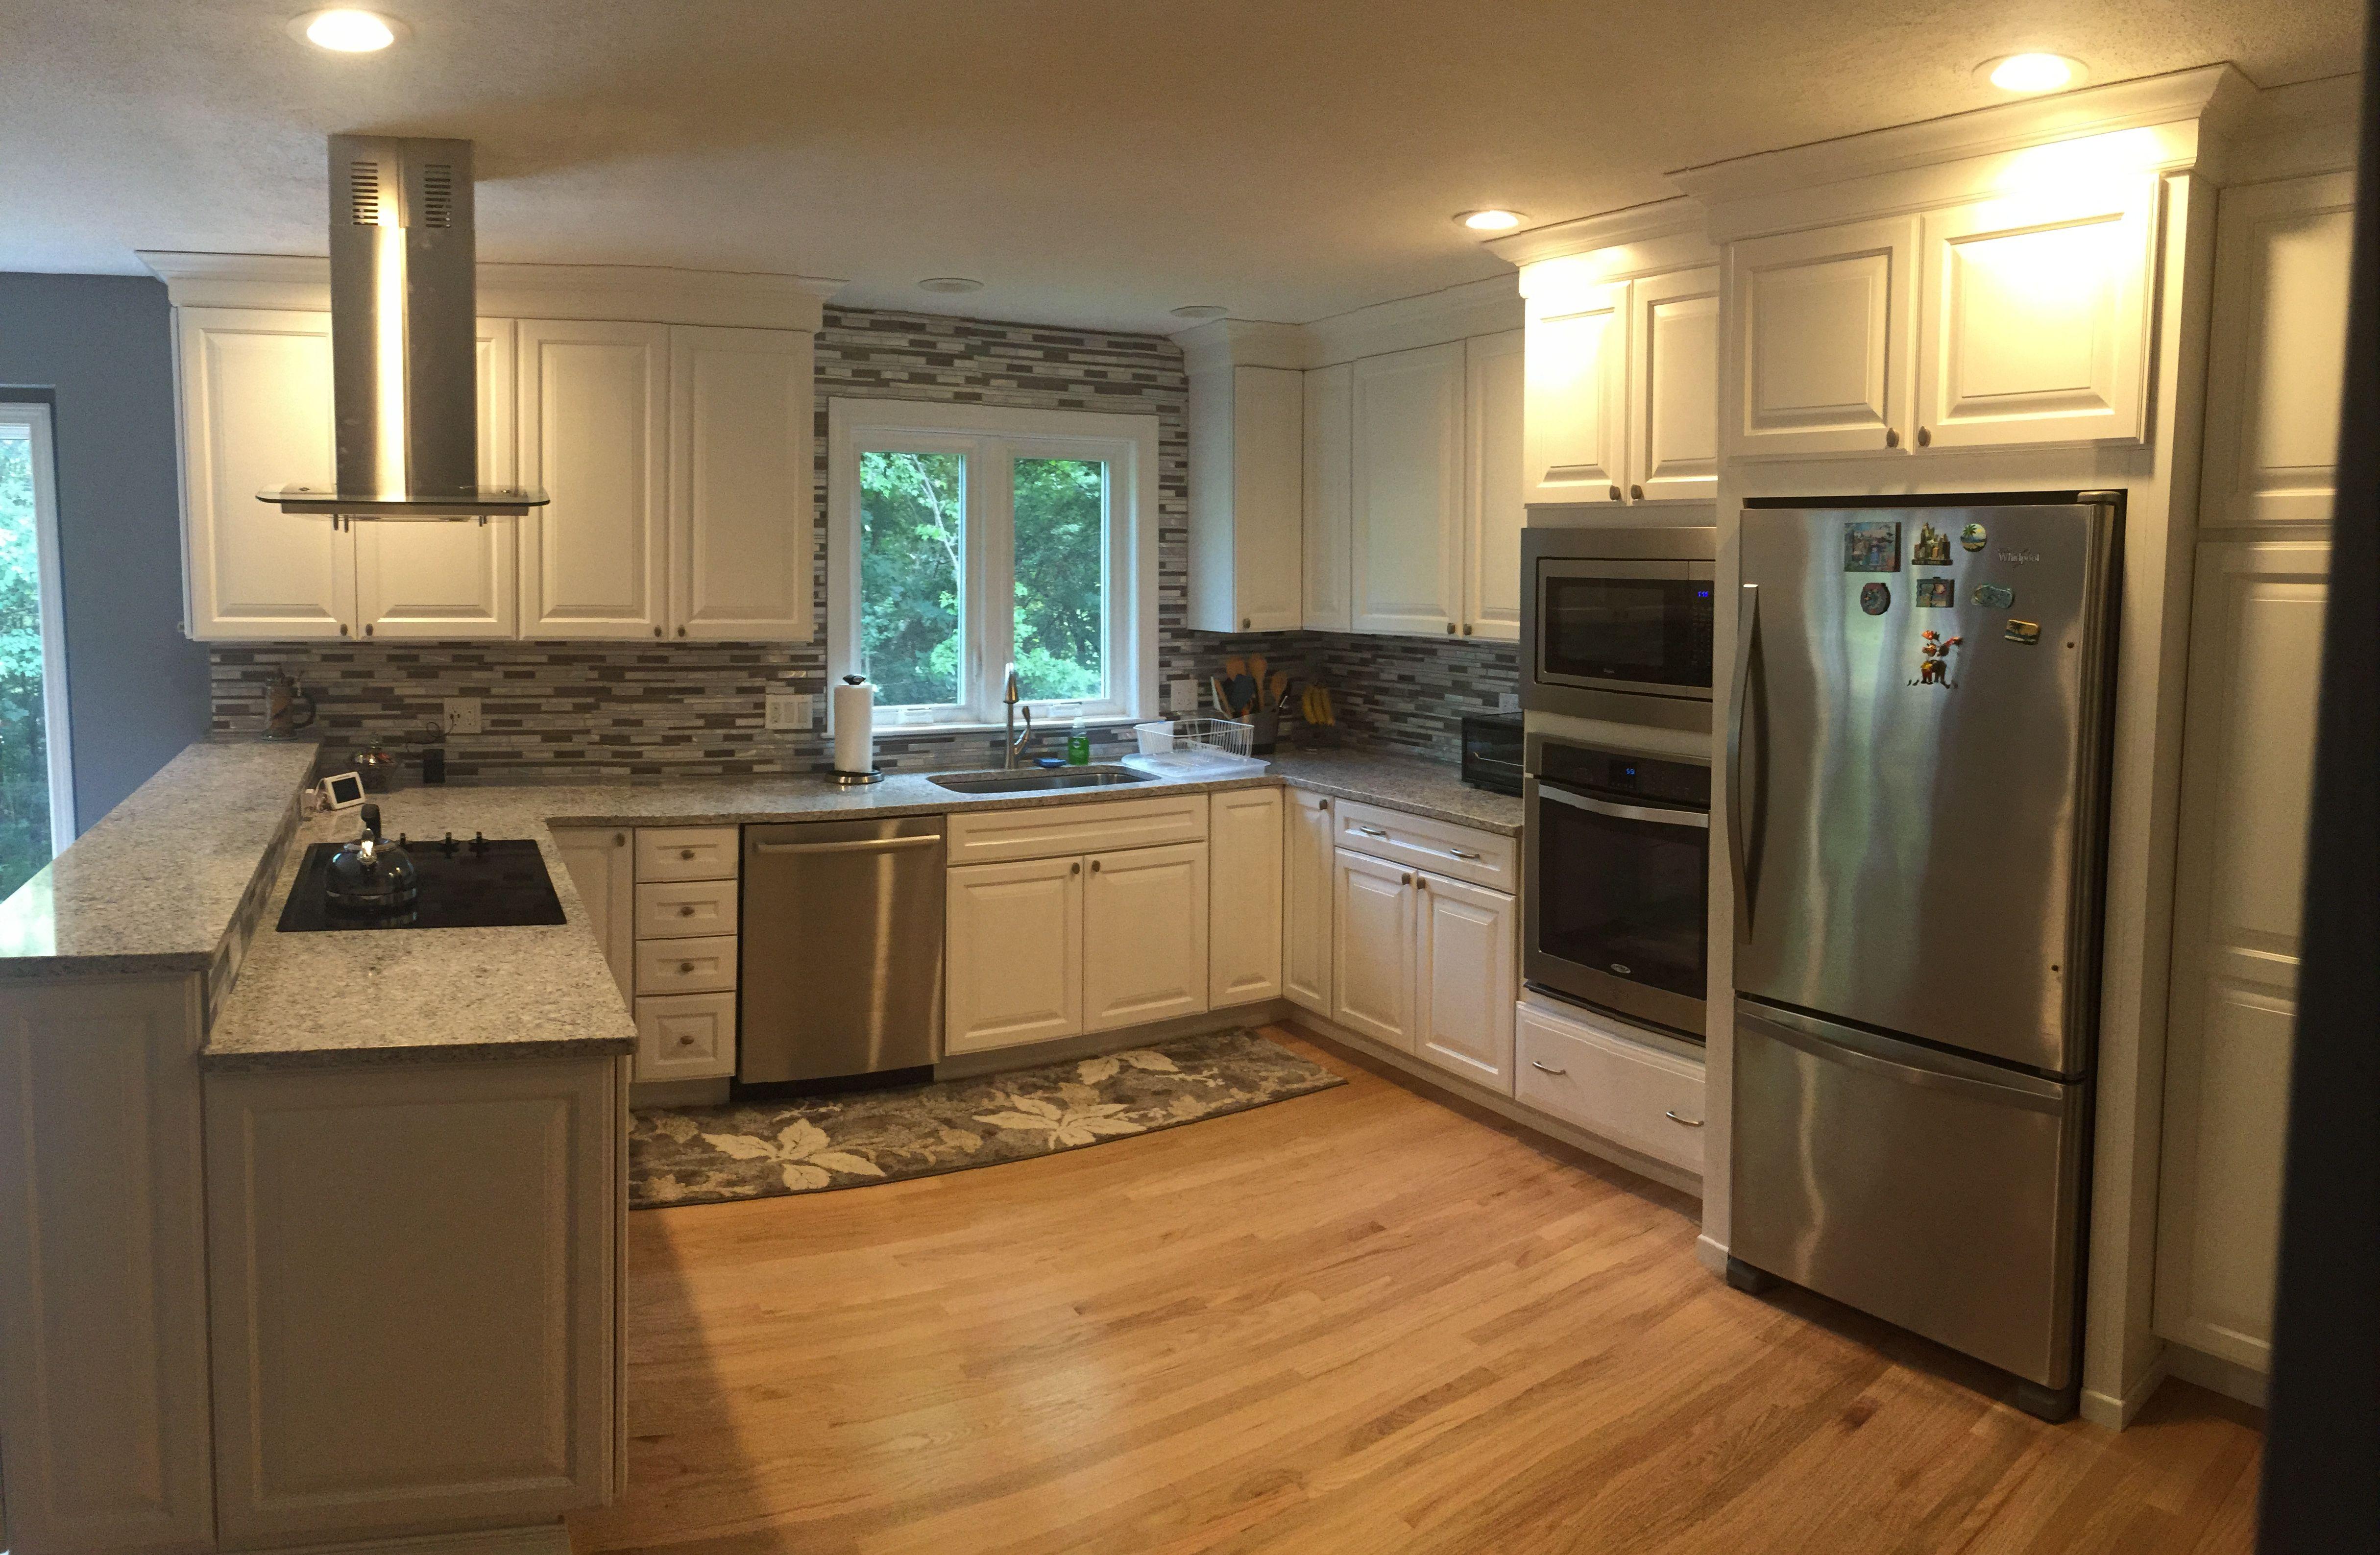 Lowe S Kitchen Remodel Kitchen Remodel Kitchen Installation Kitchen Cabinet Remodel